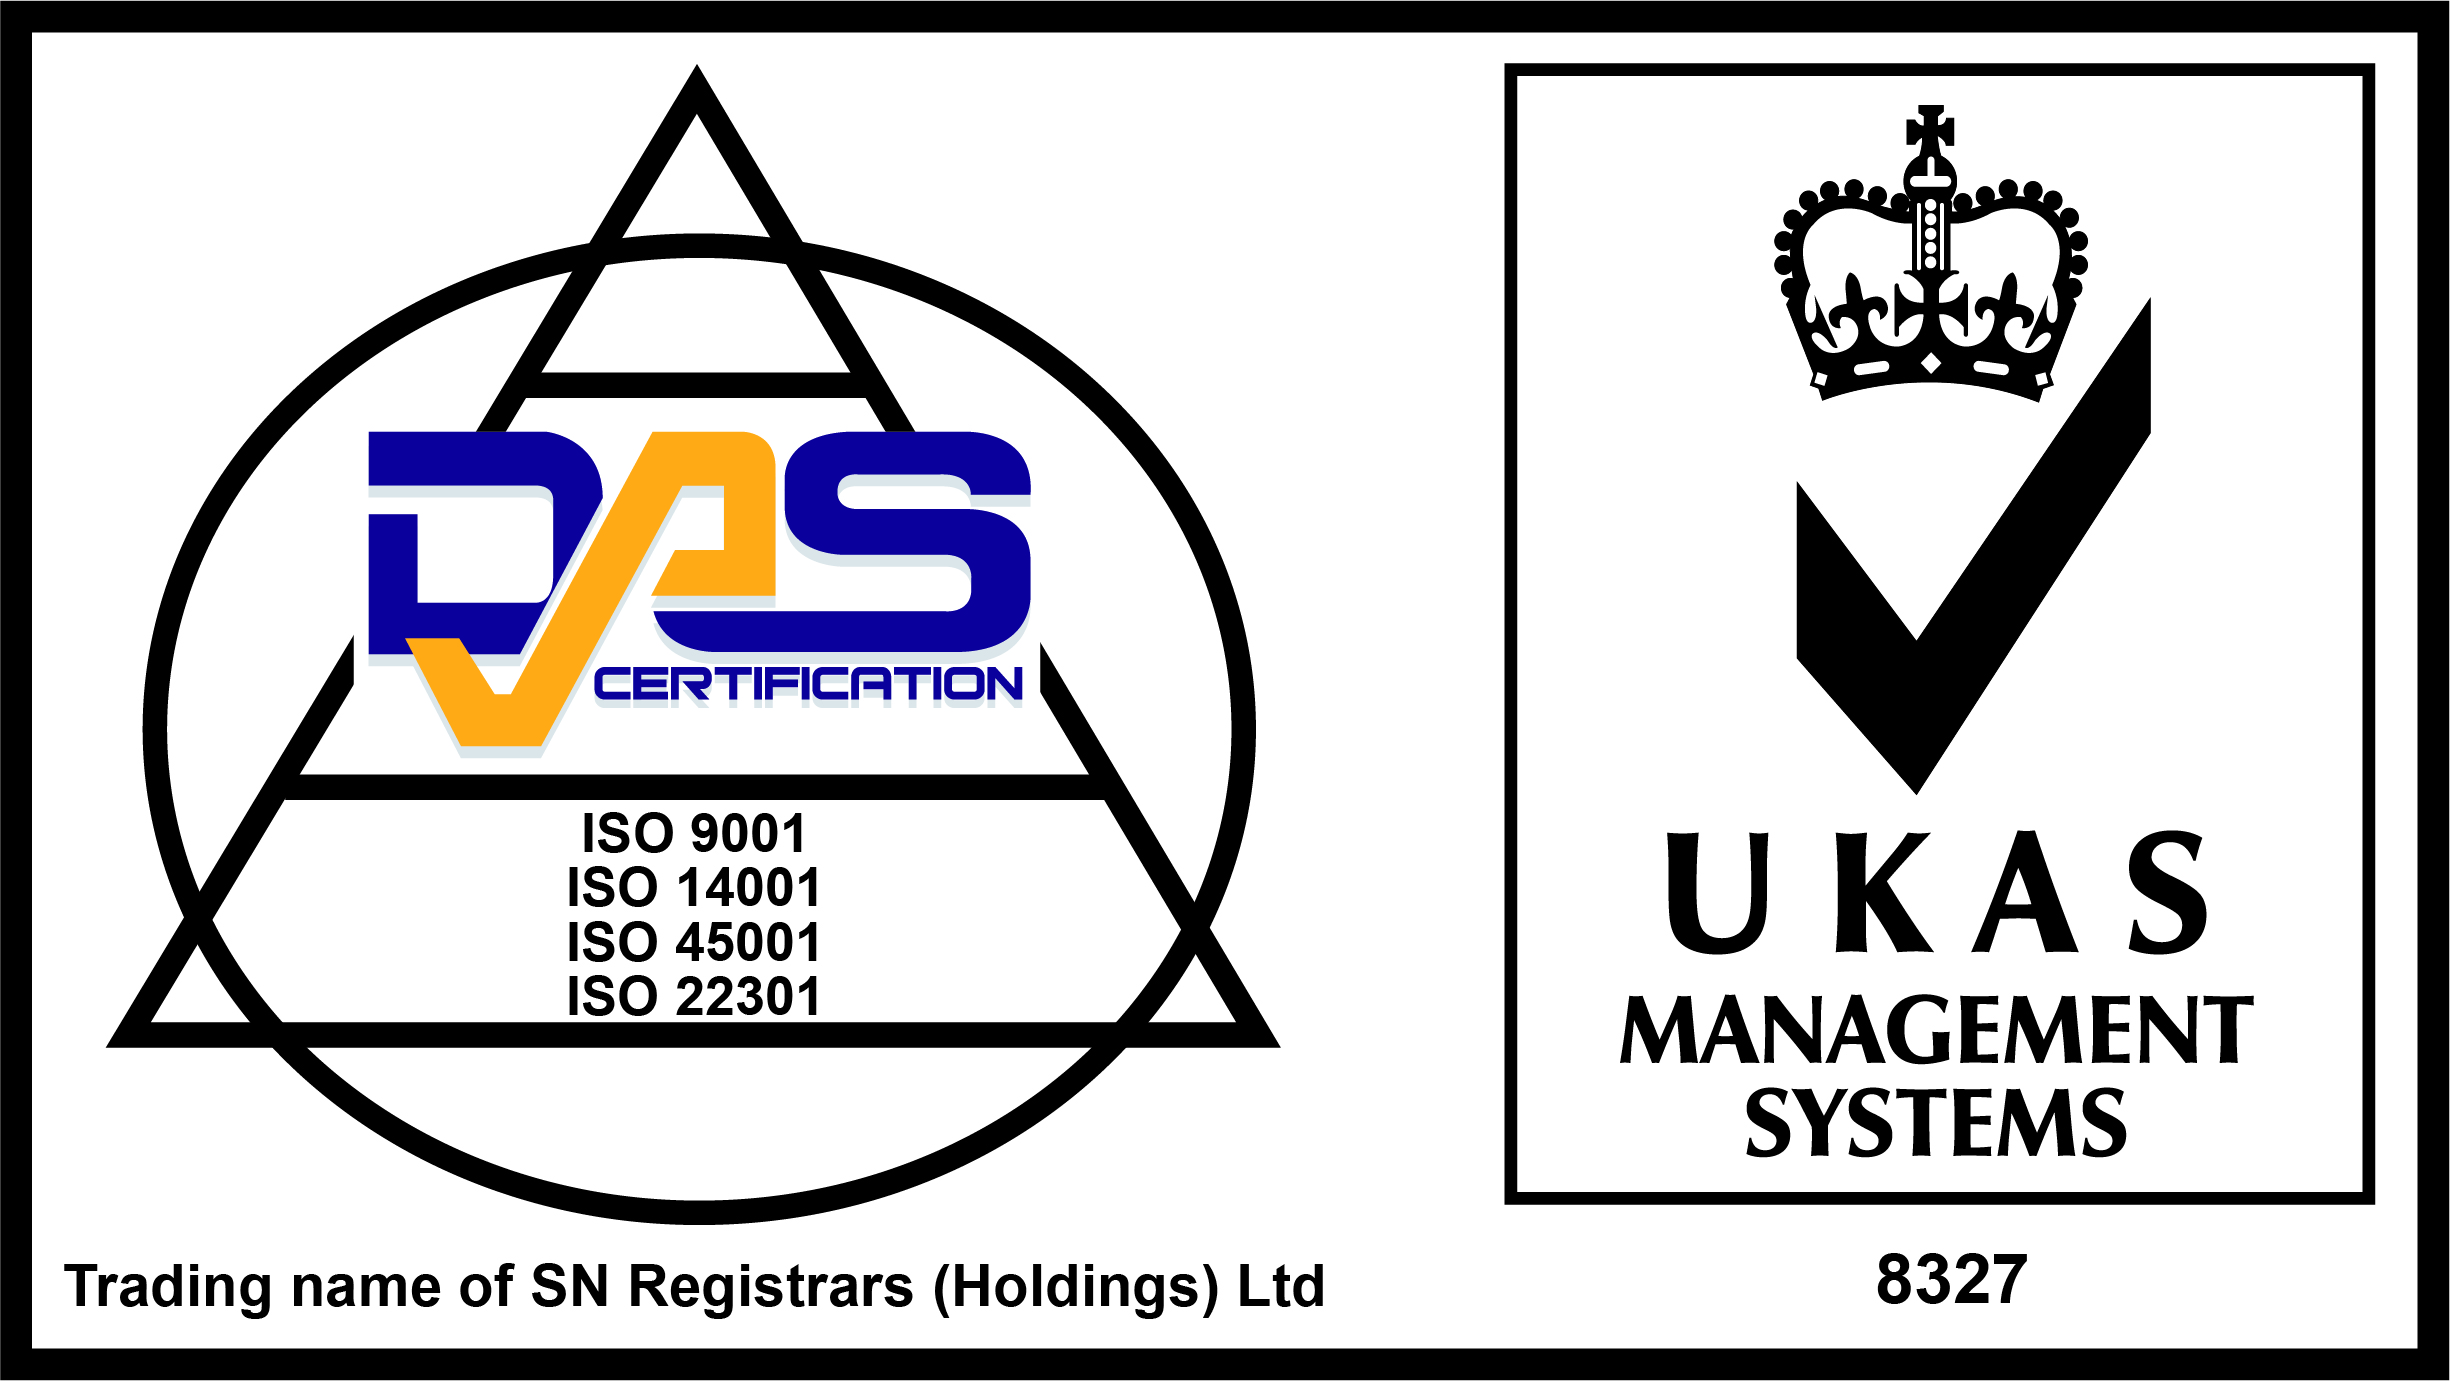 Cert_Logo_DAS_UKAS_ISO9001140014500122301-